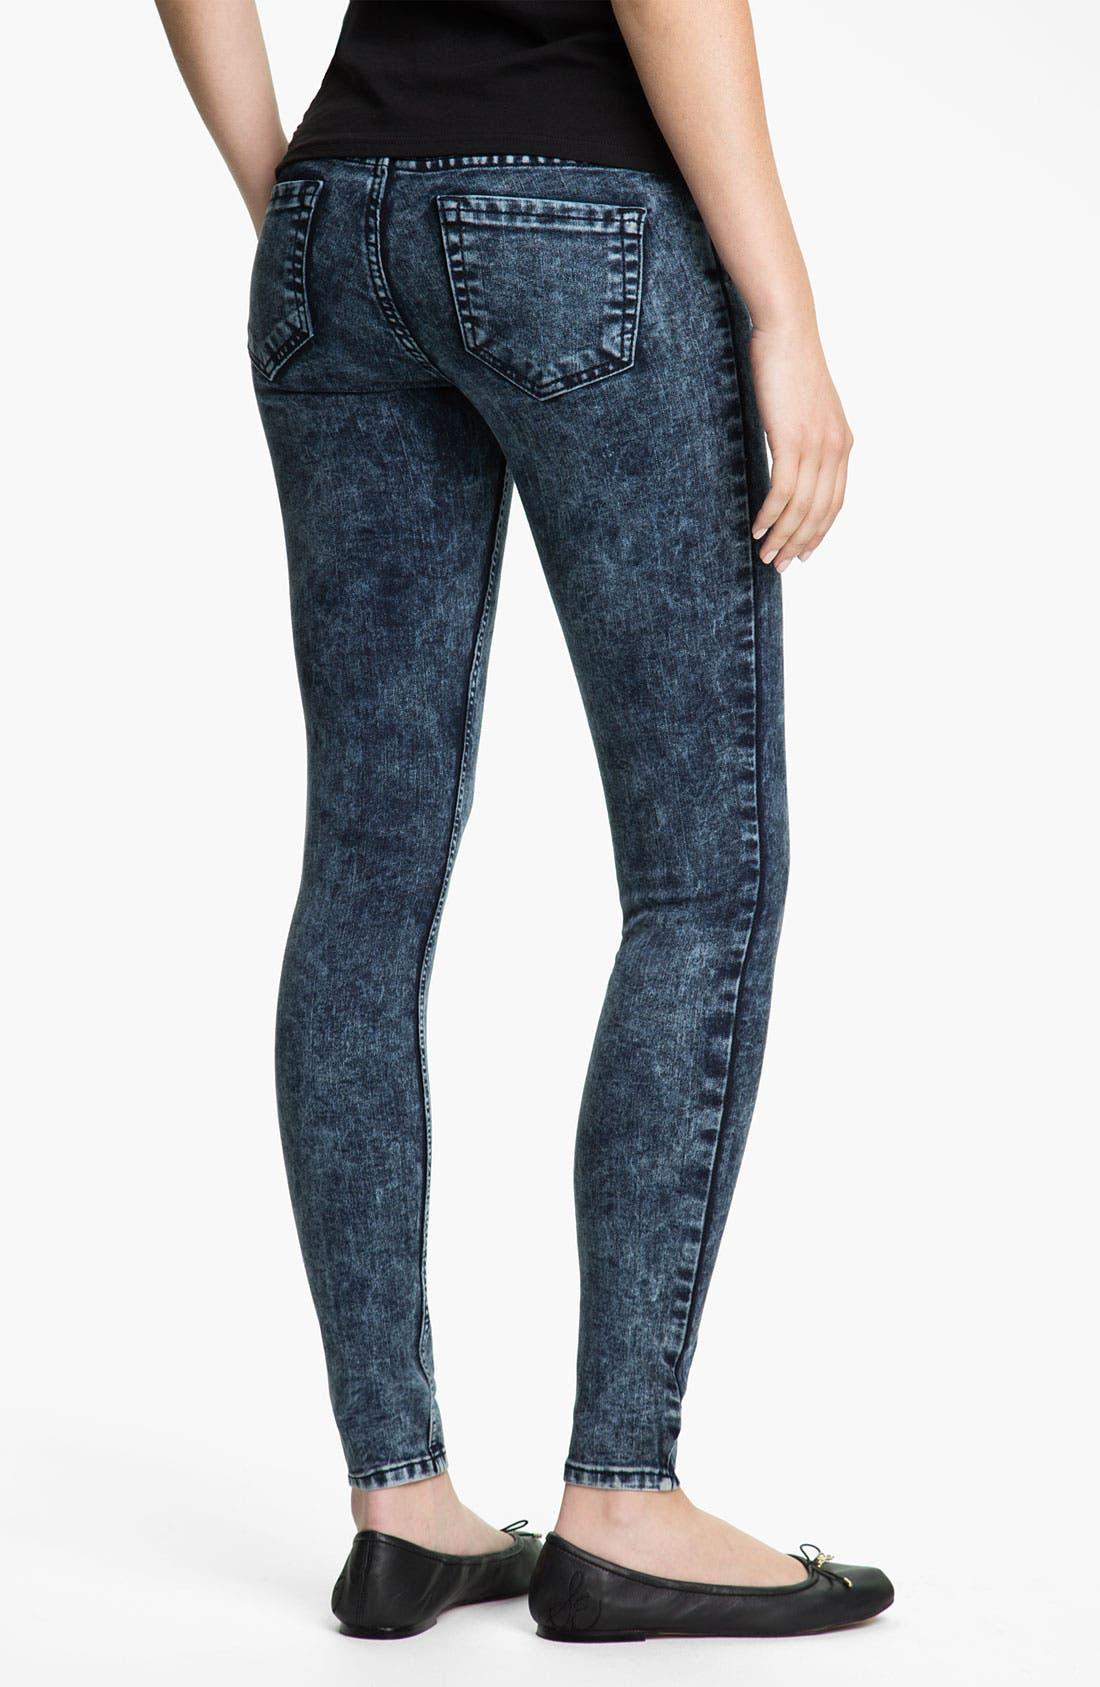 Alternate Image 1 Selected - See Thru Soul Acid Wash Skinny Jeans (Juniors)